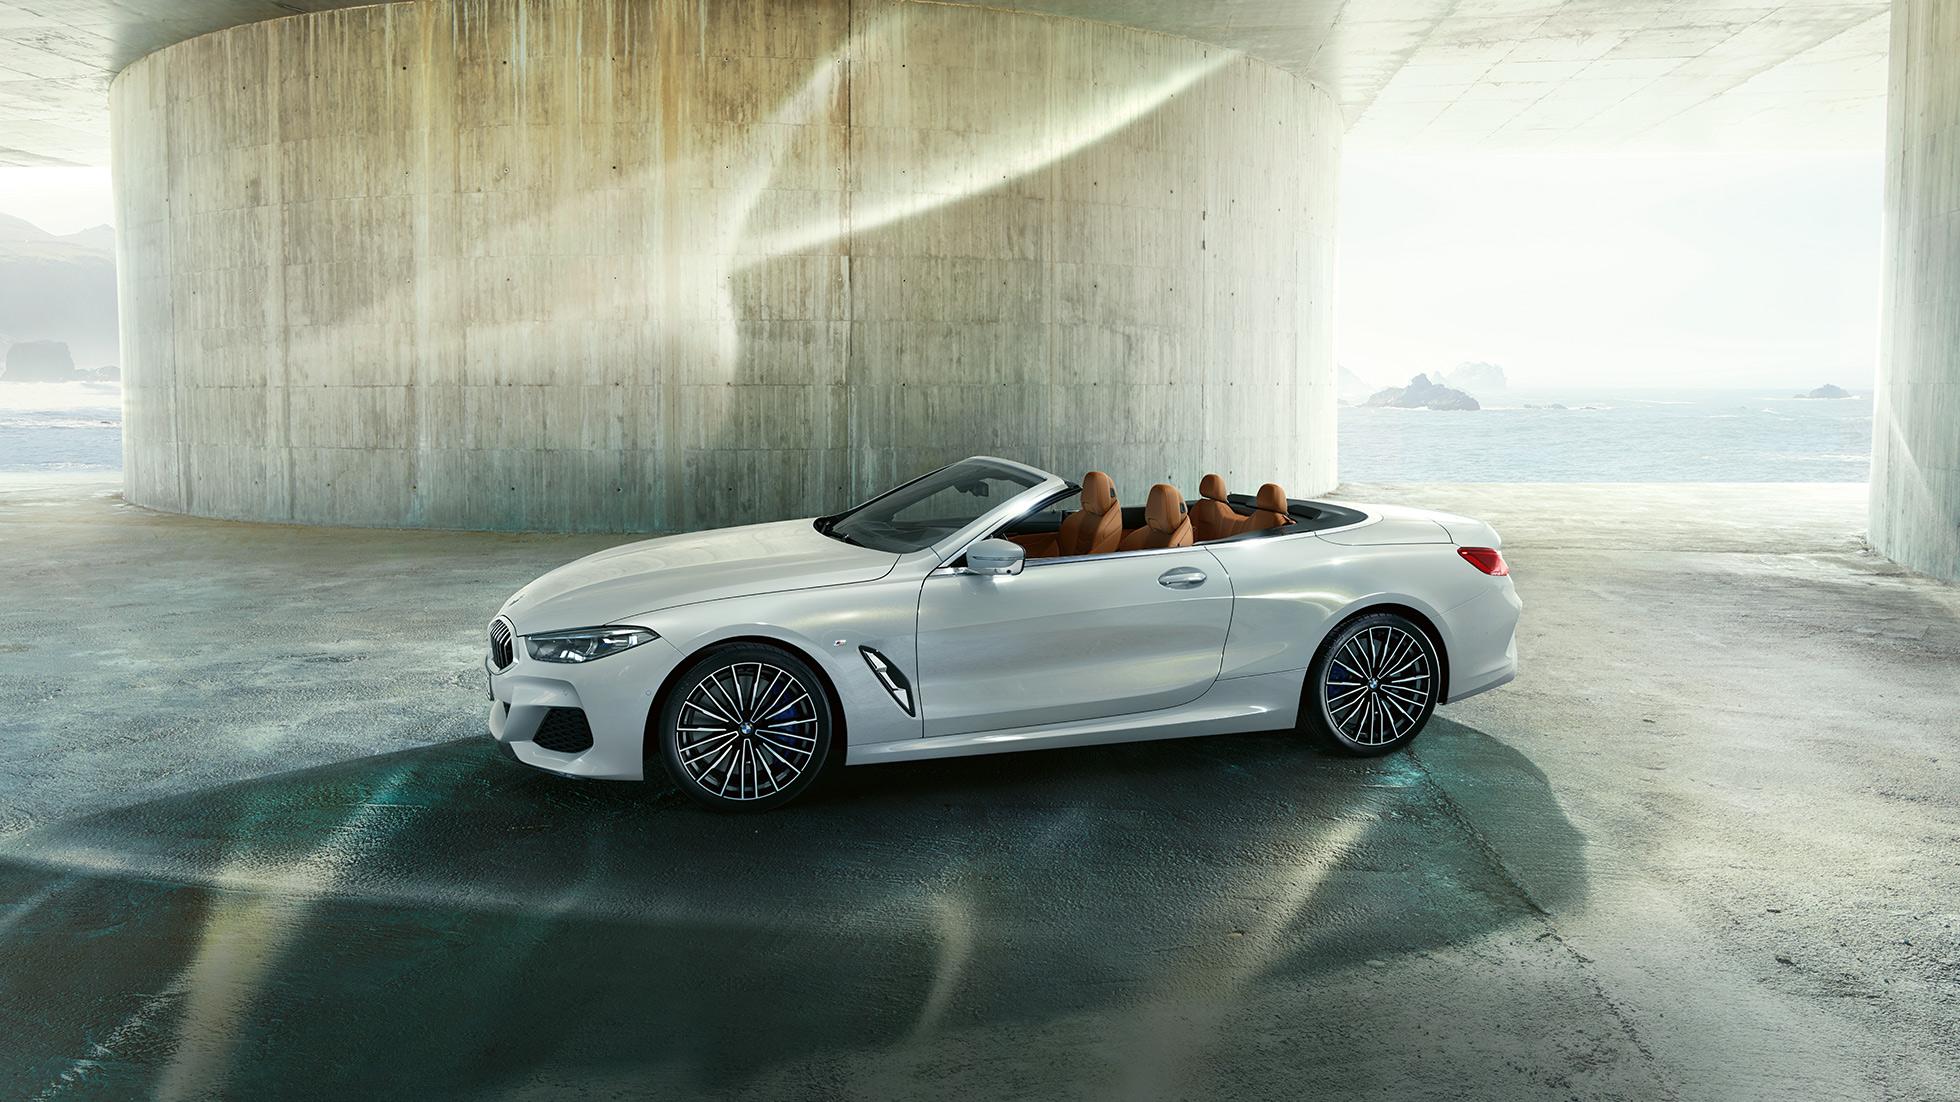 BMW M850i xDrive, металлик Белый Минерал, вид сбоку, мягкий верх опущен.